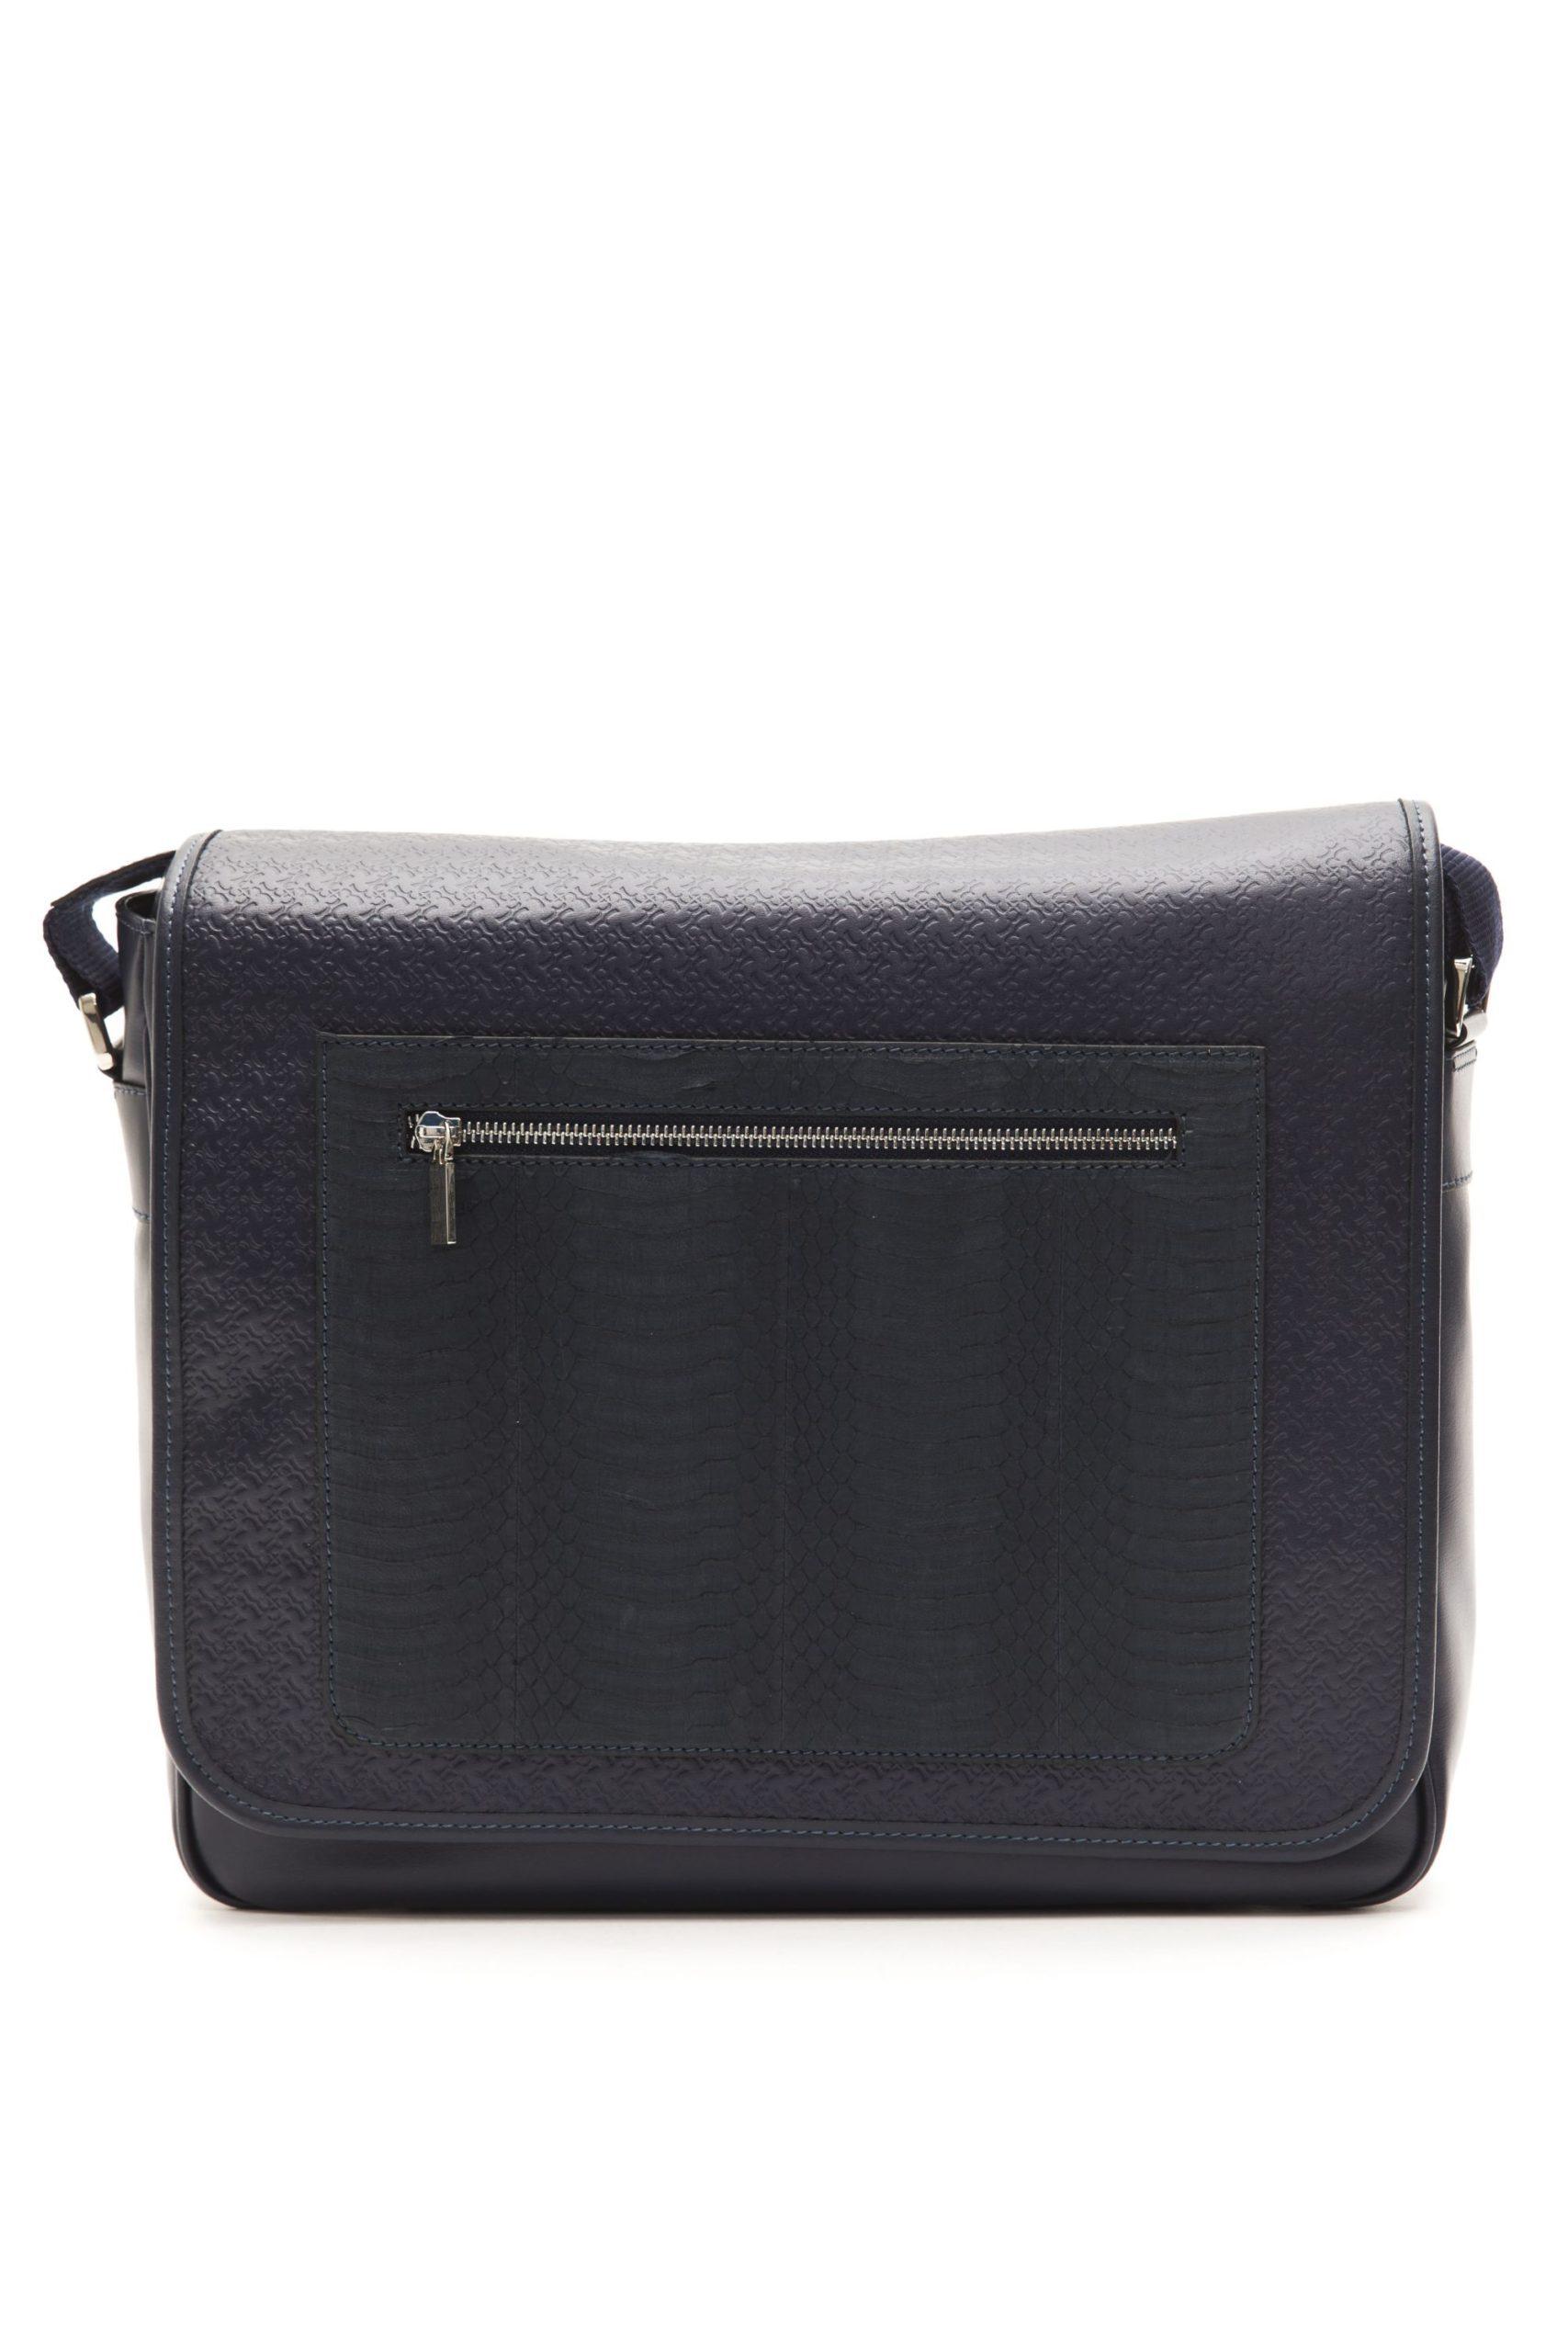 Billionaire Italian Couture Men's Messenger Bag Blue BI1004093